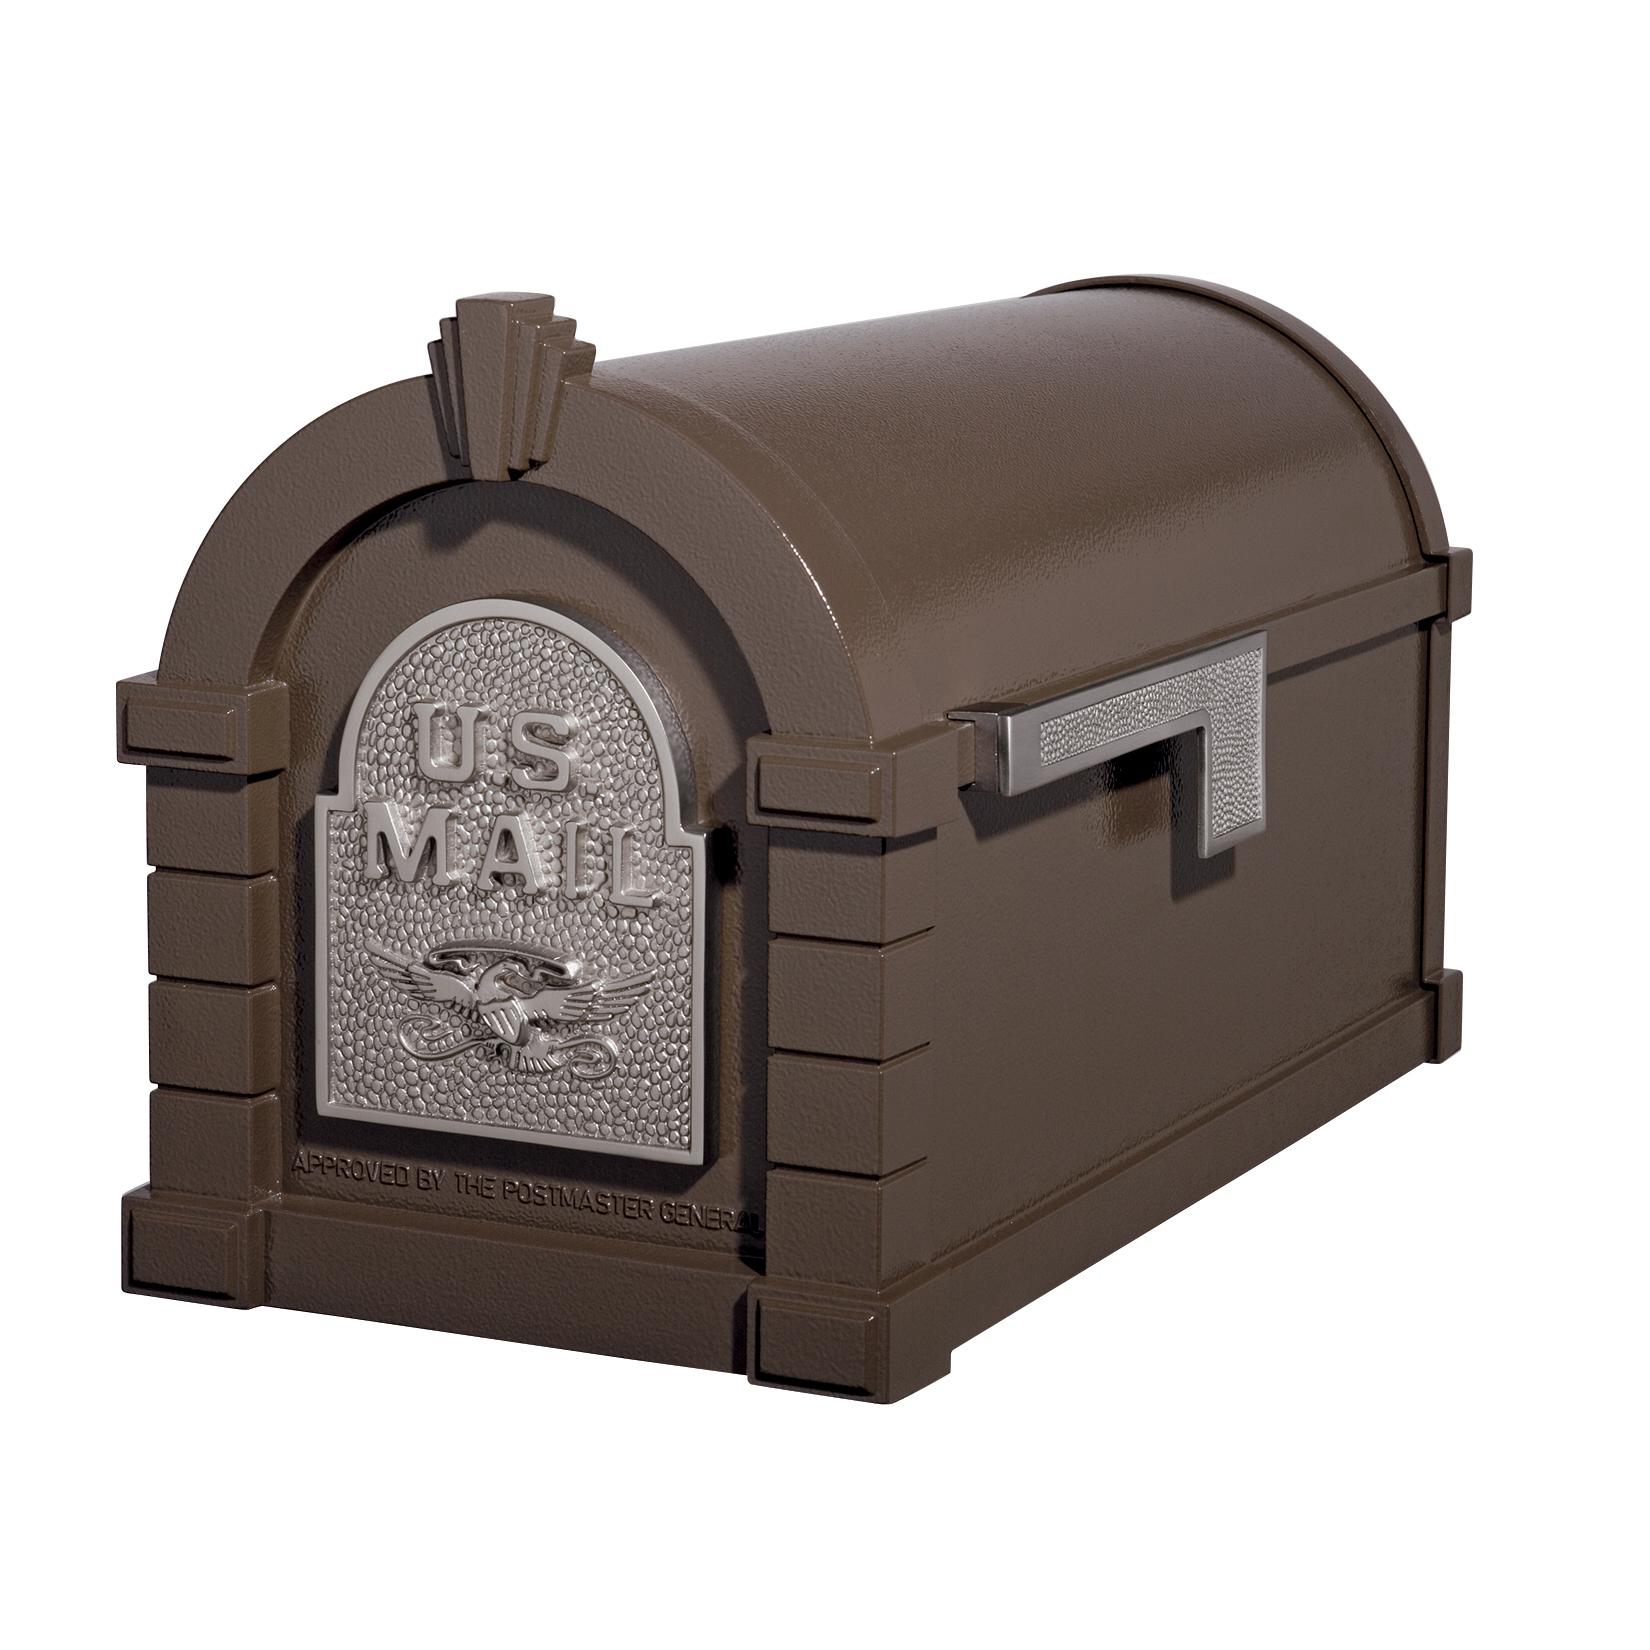 Gaines Eagle Keystone MailboxesBronze with Satin Nickel